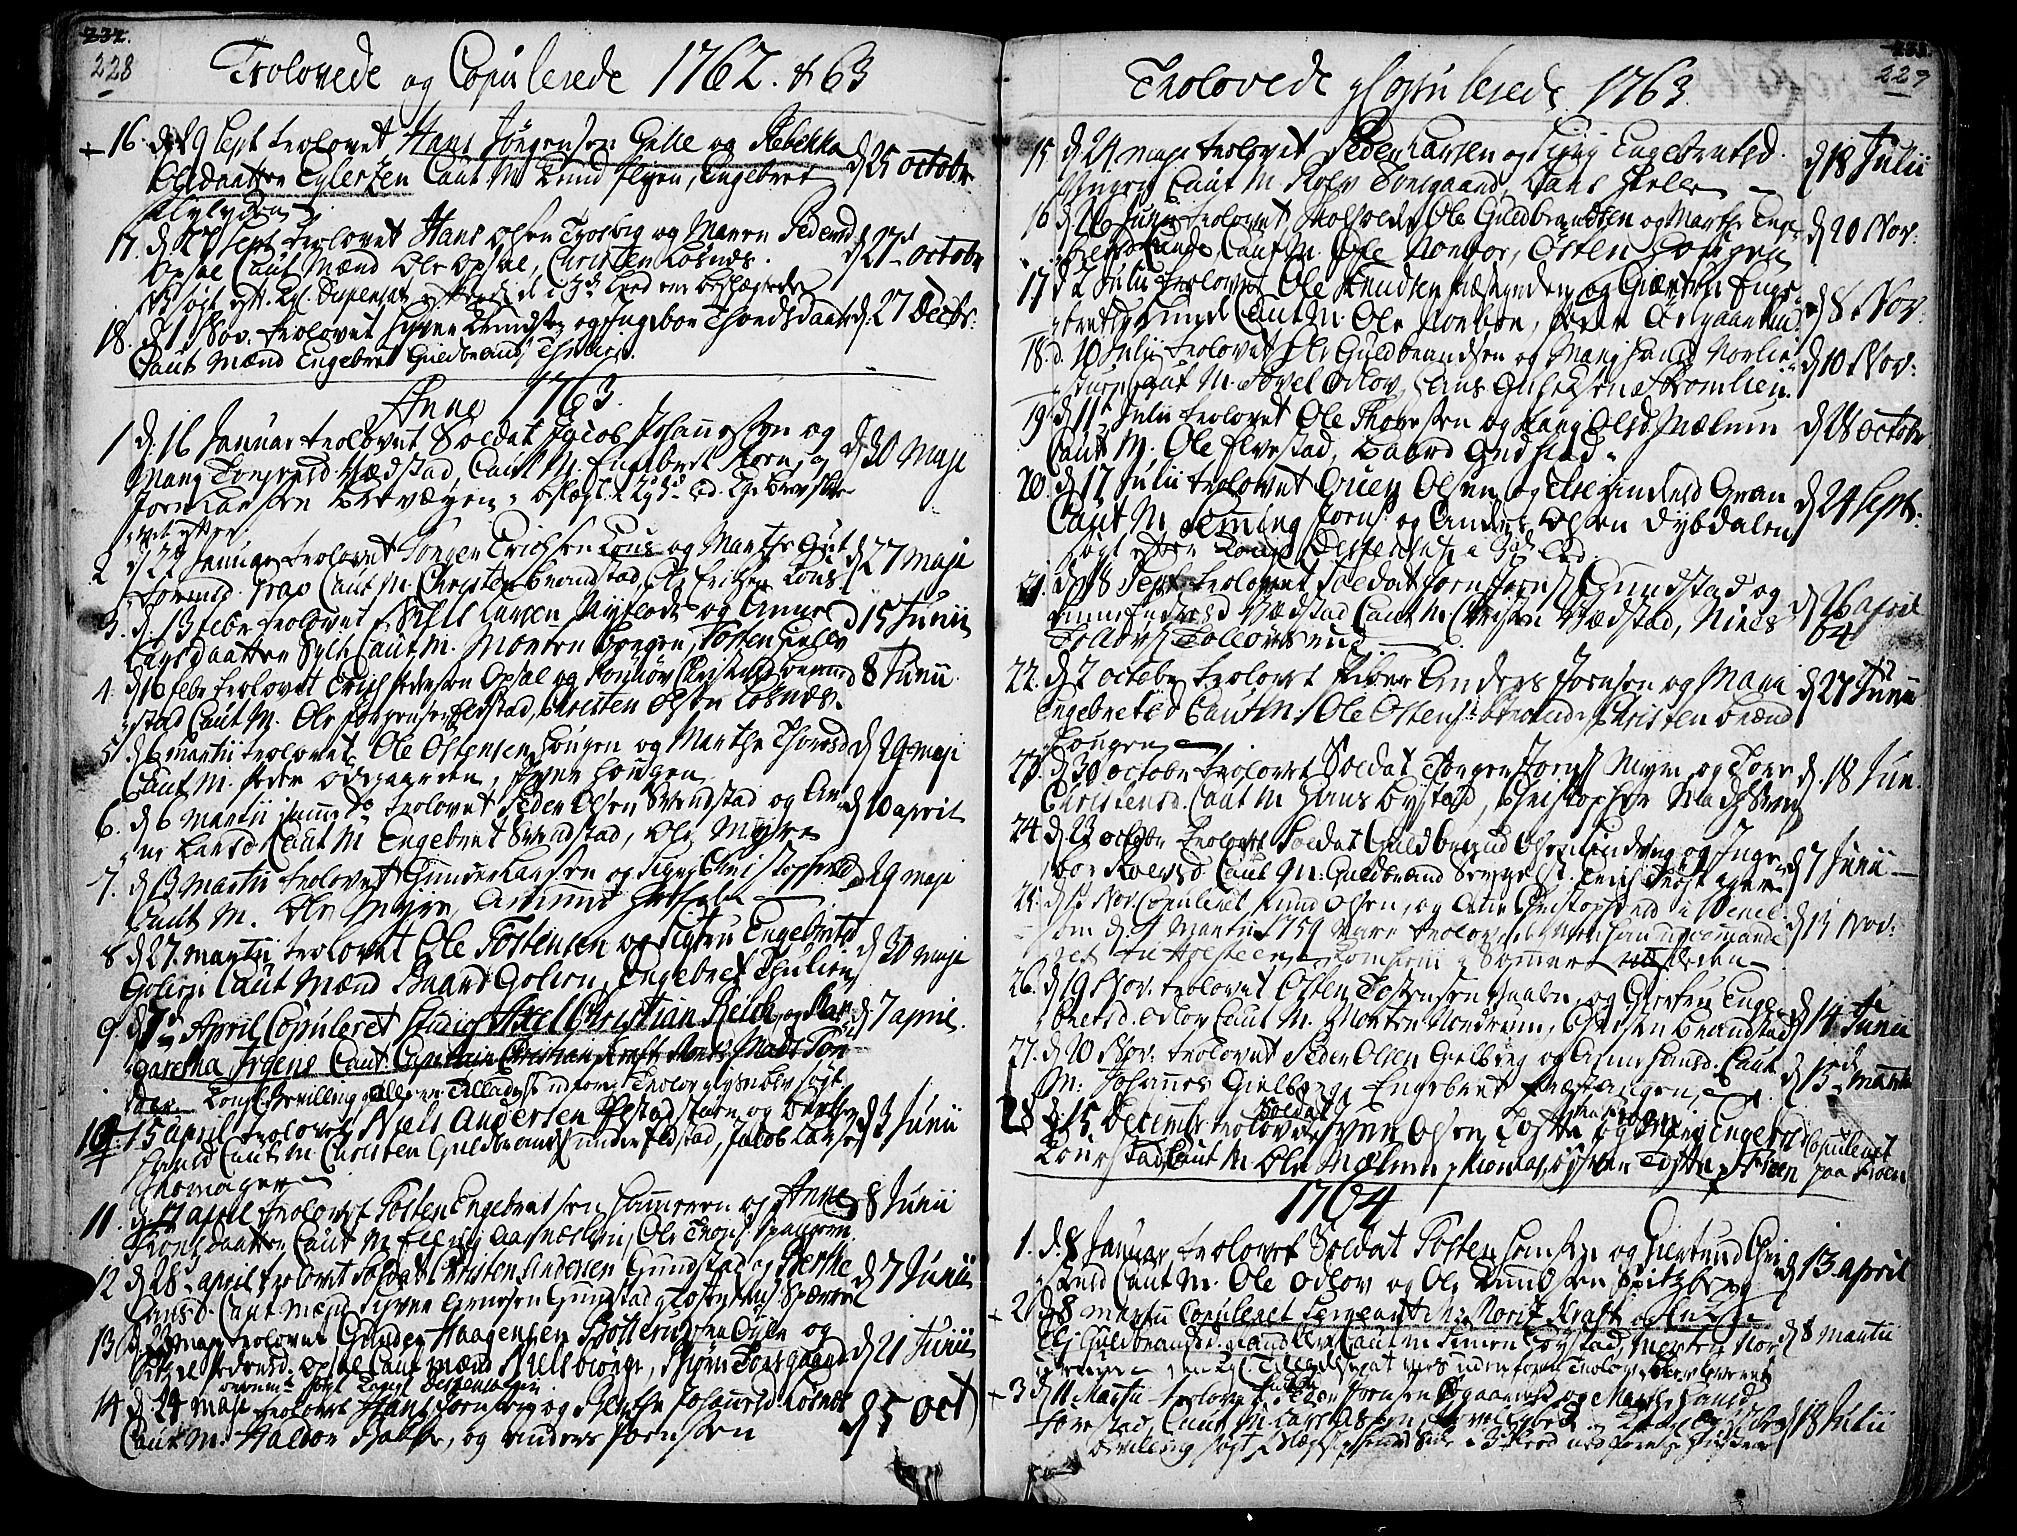 SAH, Ringebu prestekontor, Ministerialbok nr. 2, 1734-1780, s. 228-229